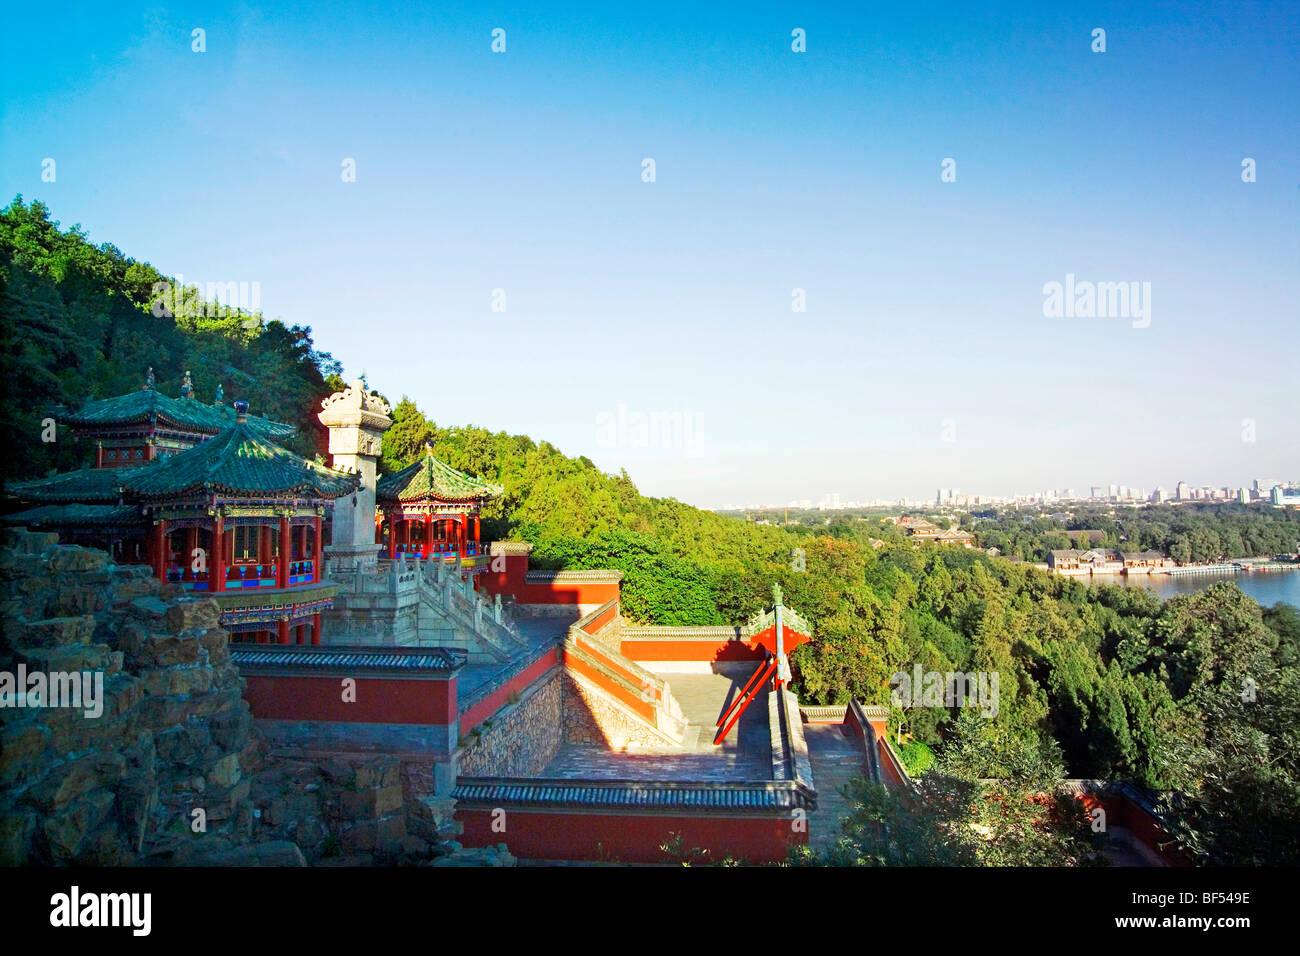 Revolving Archives, Summer Palace, Beijing, China - Stock Image